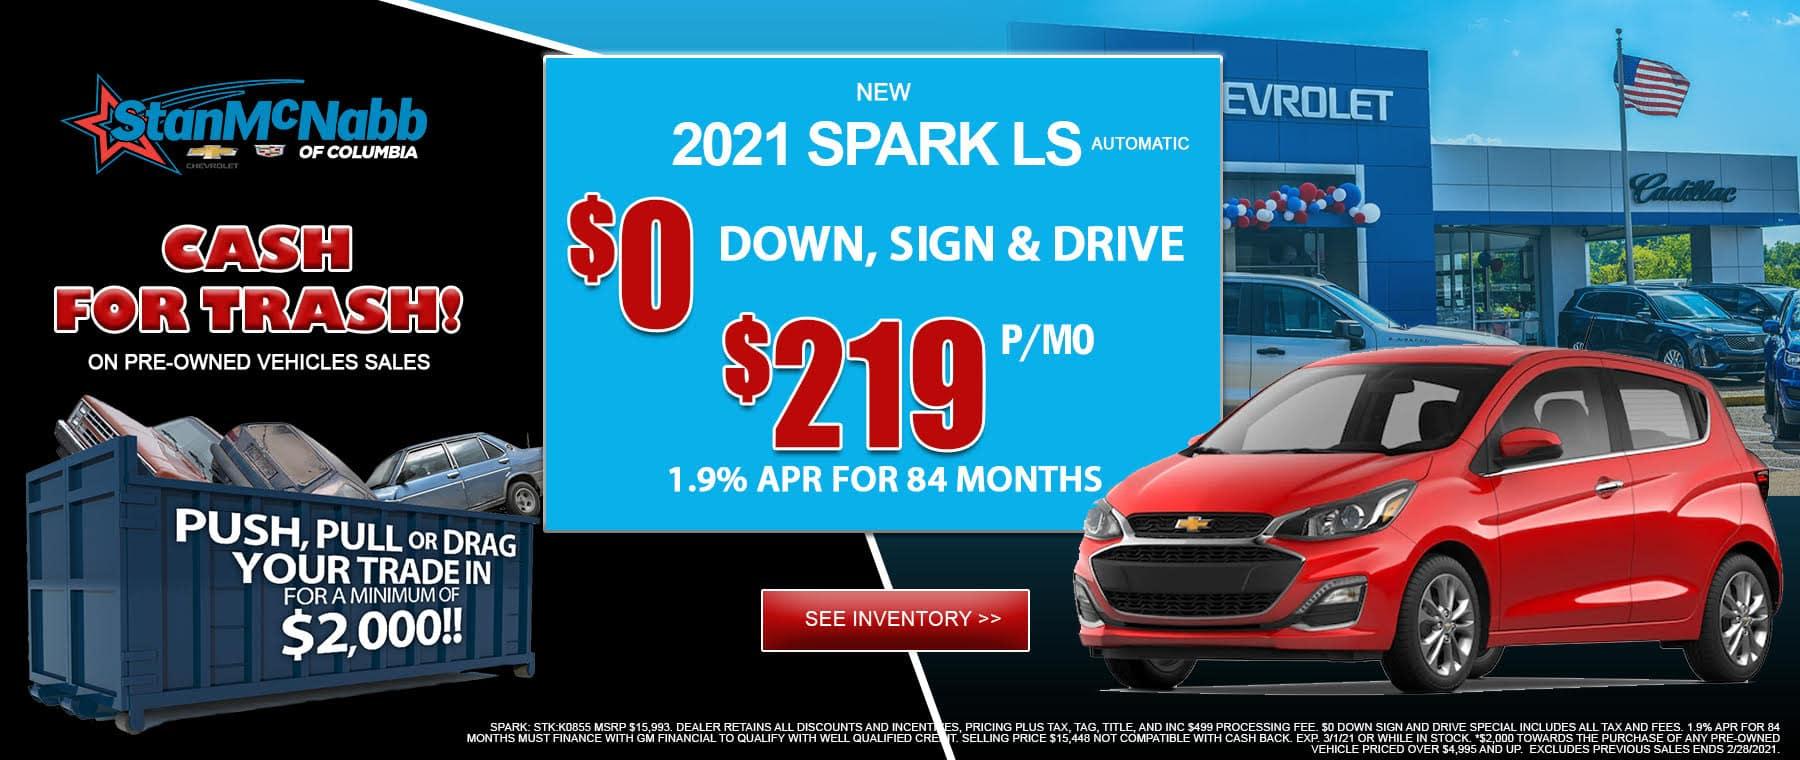 2021 spark ls